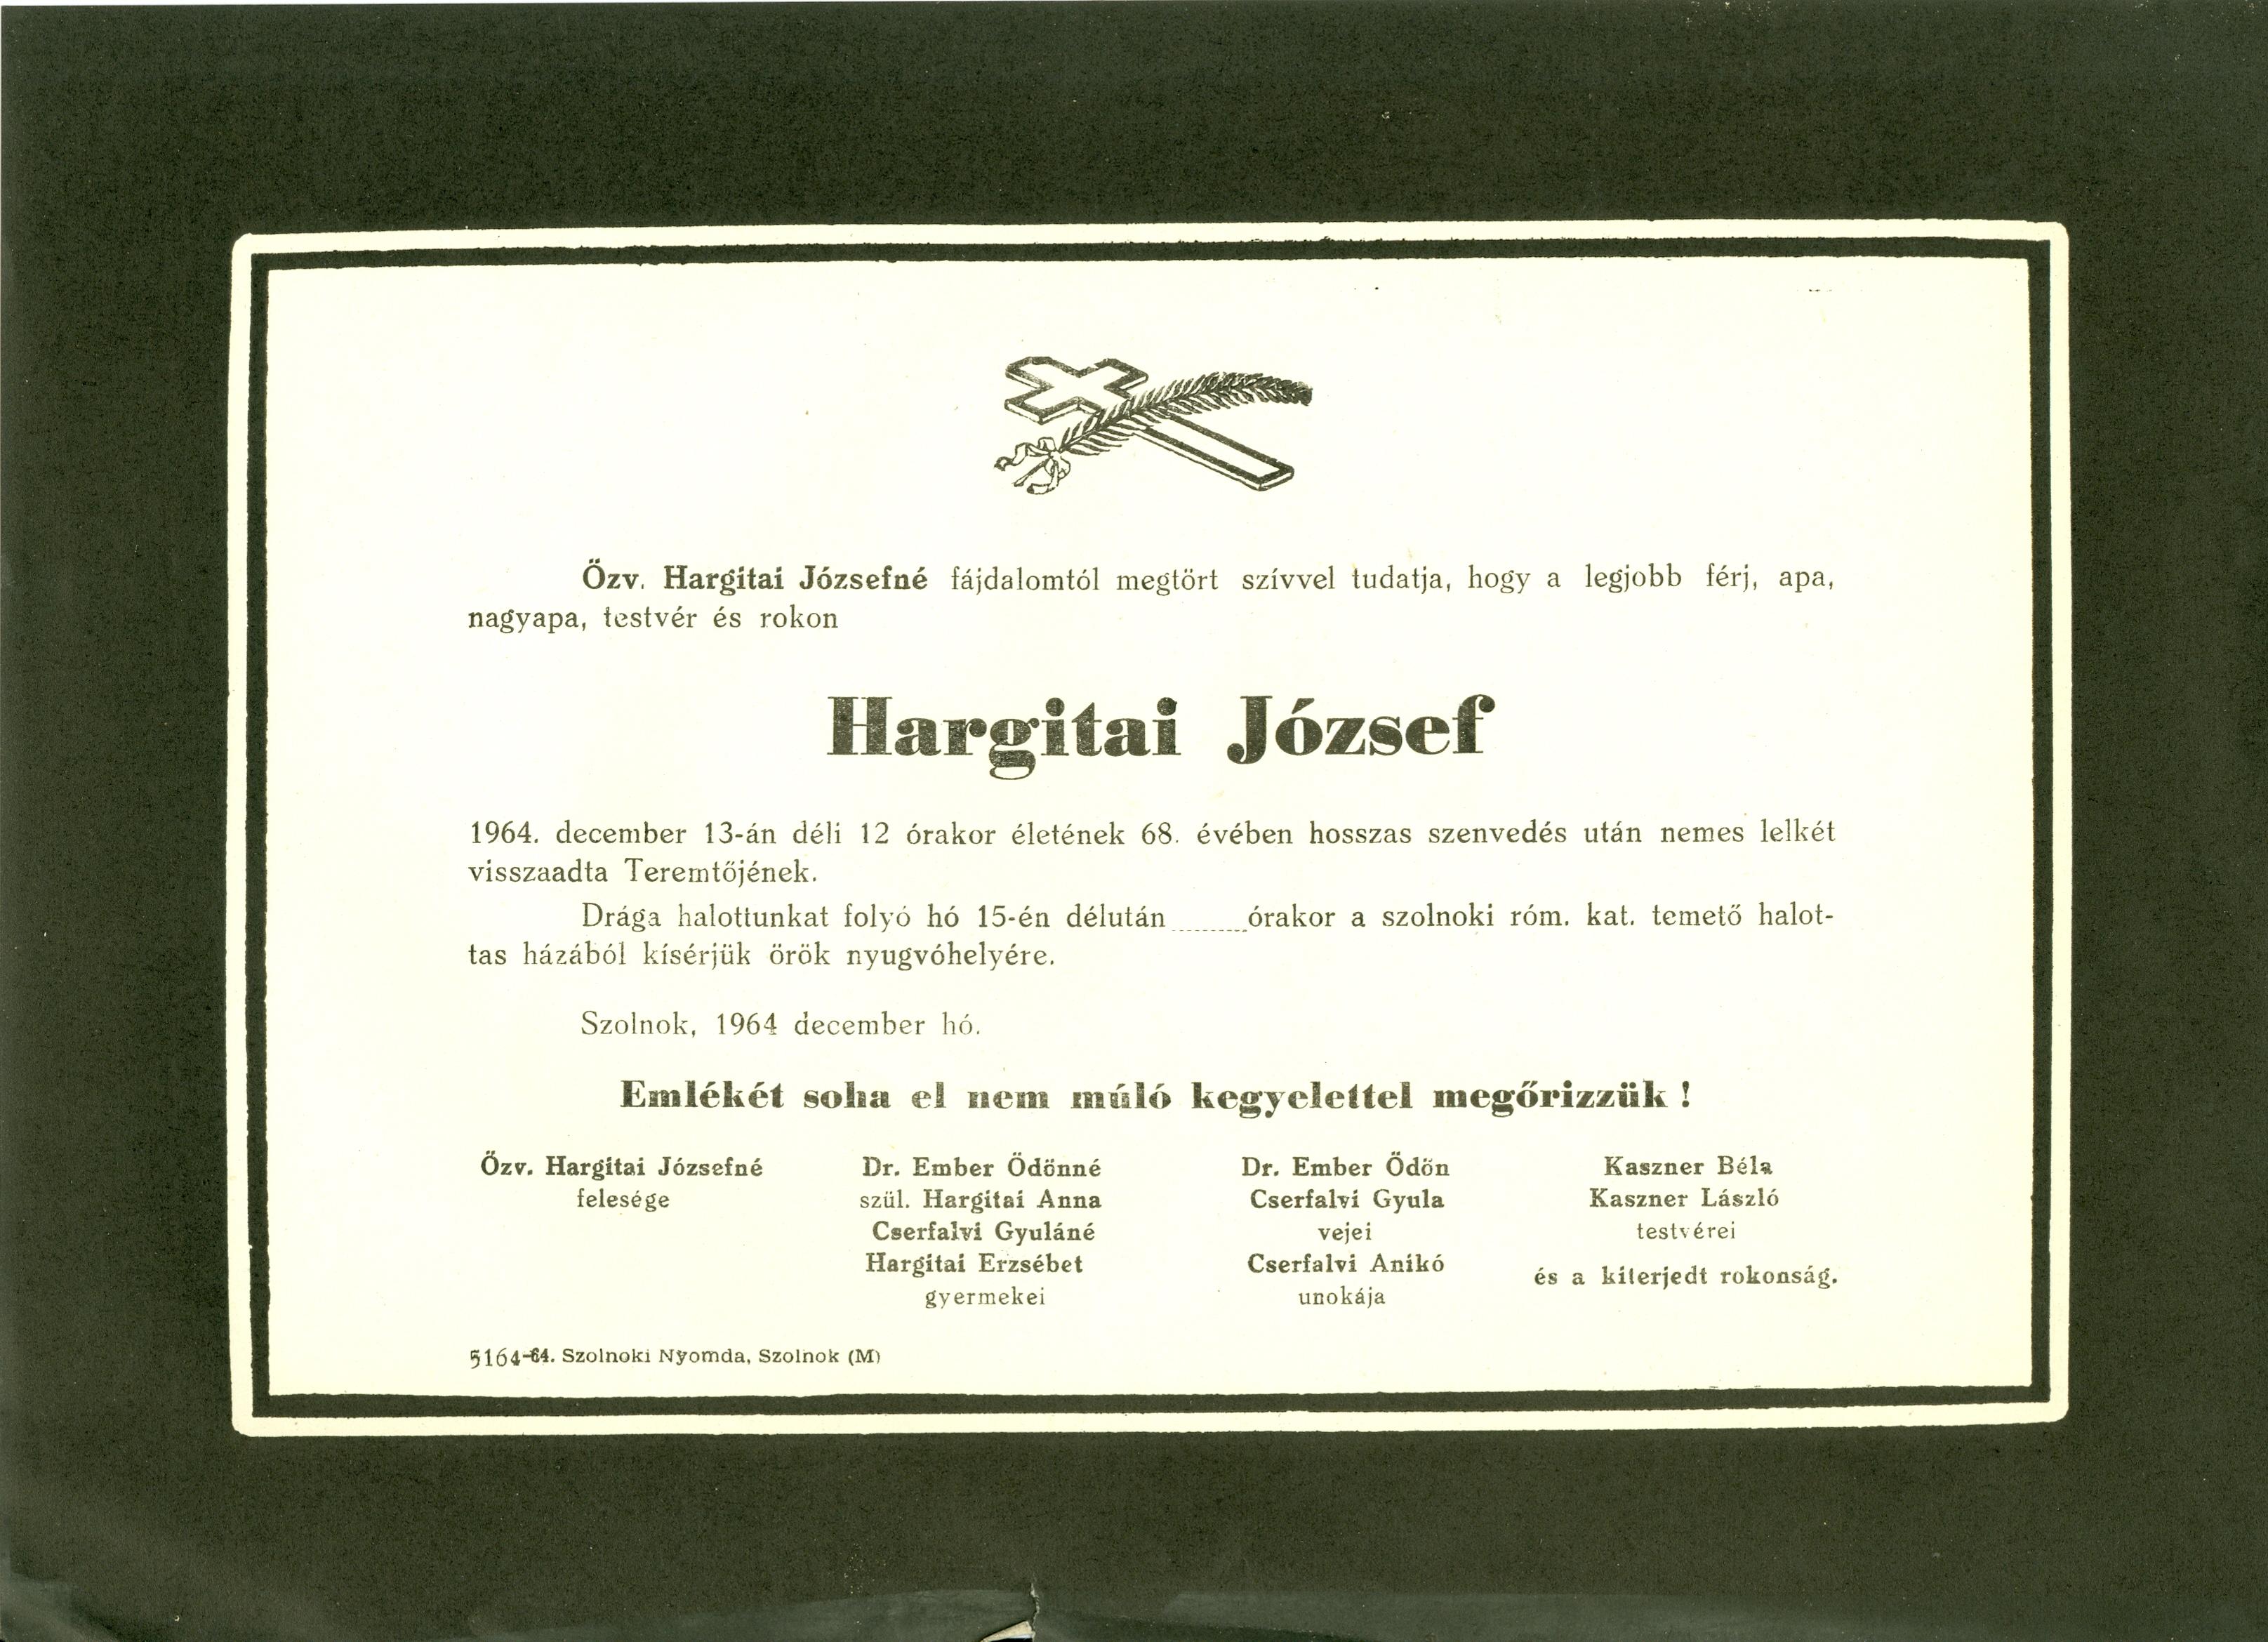 Hargitai József